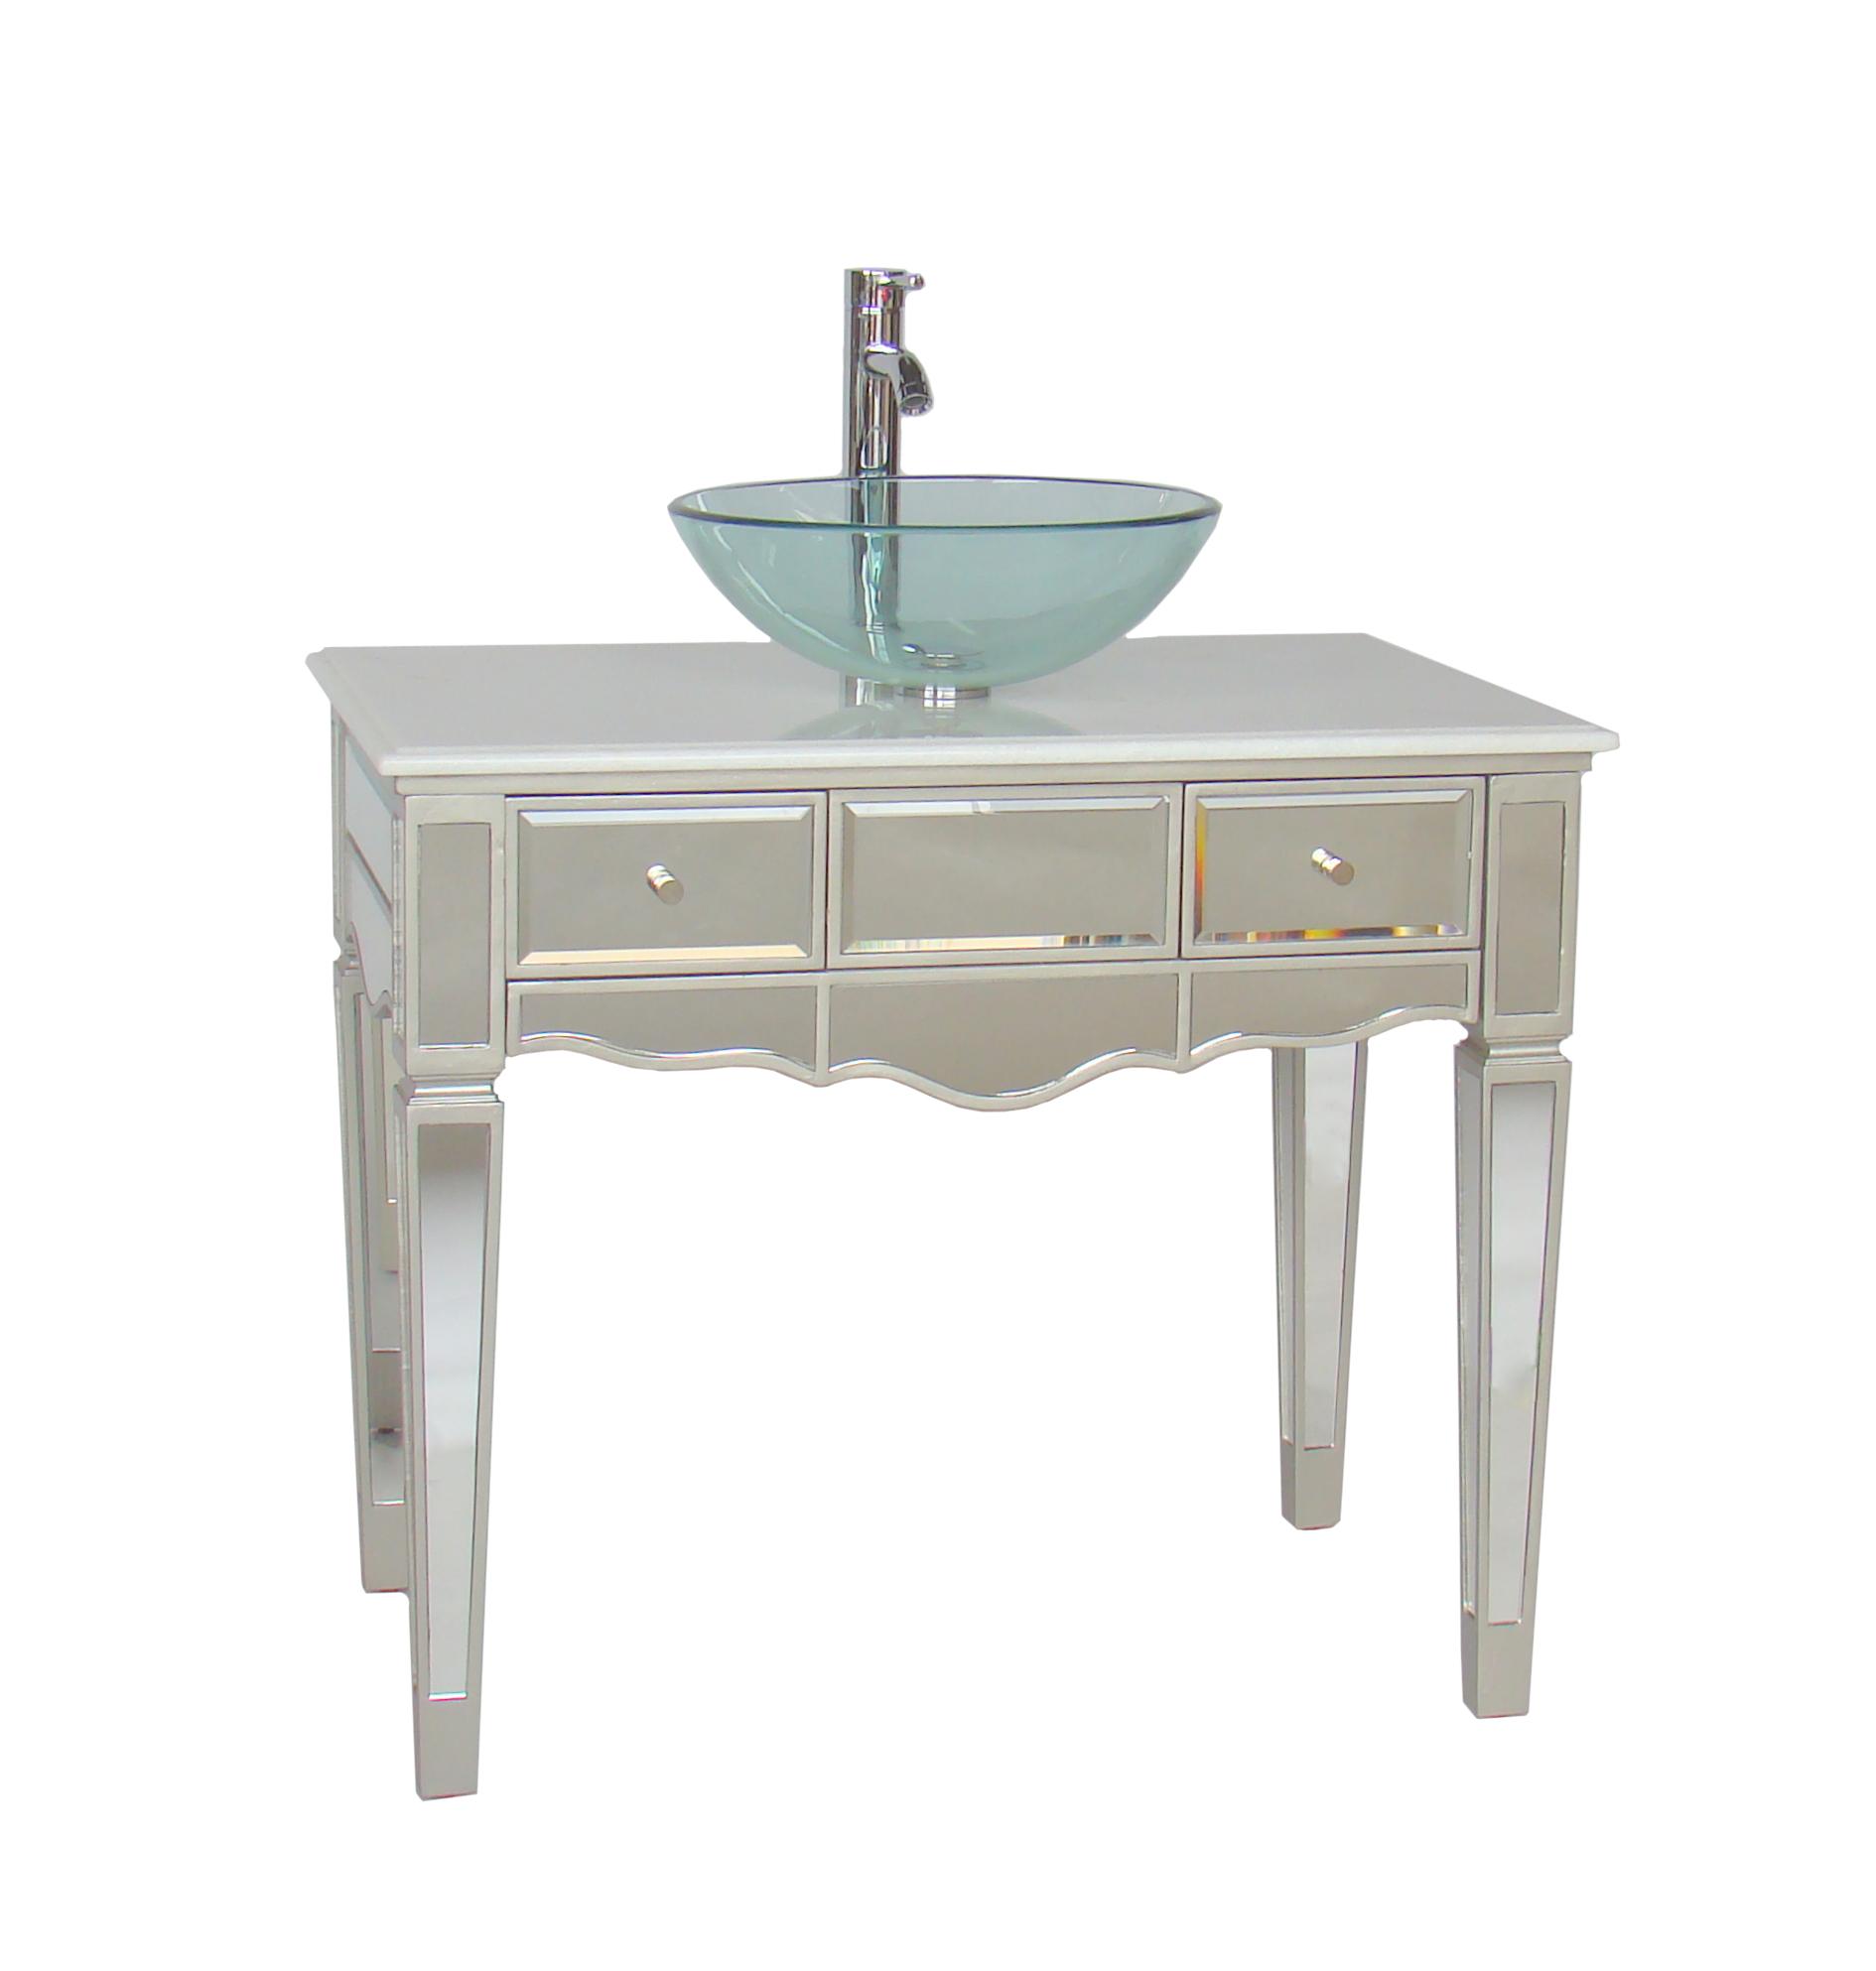 12 inch to 29 inch wide vanities single sink cabinet limited space vanity. Black Bedroom Furniture Sets. Home Design Ideas